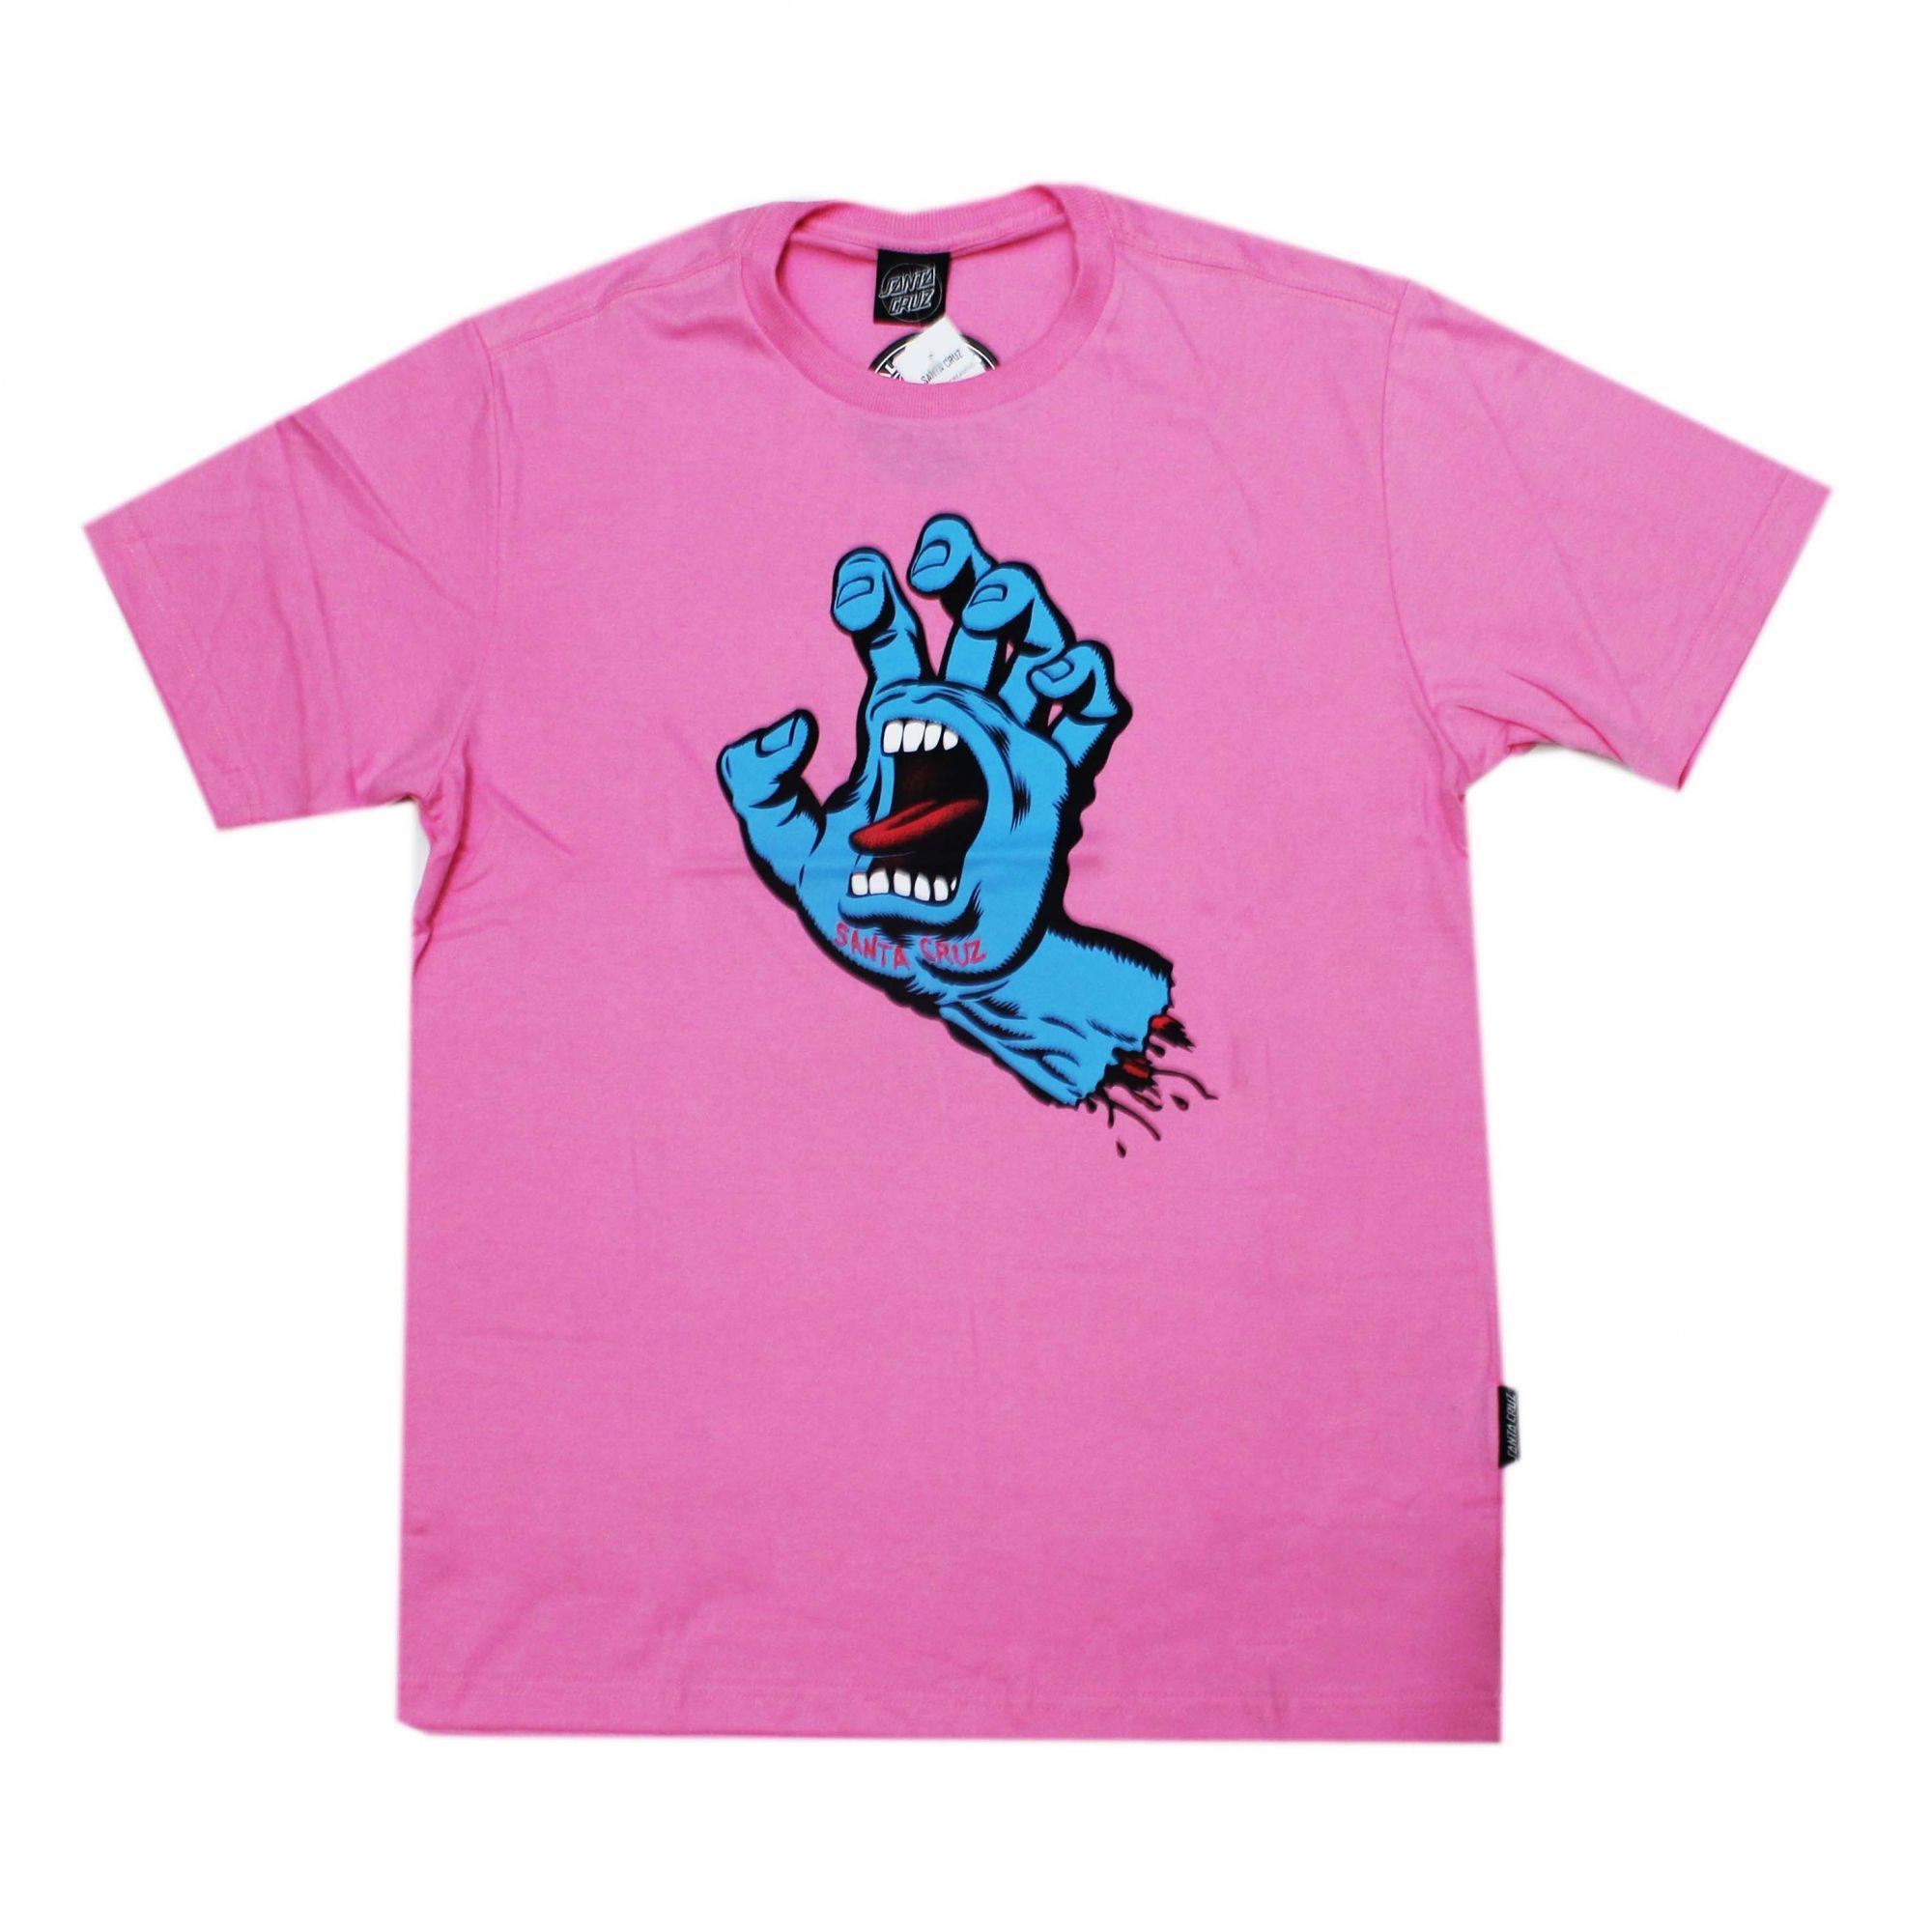 Camiseta Santa Cruz  Screaming Hand Rosa/Azul